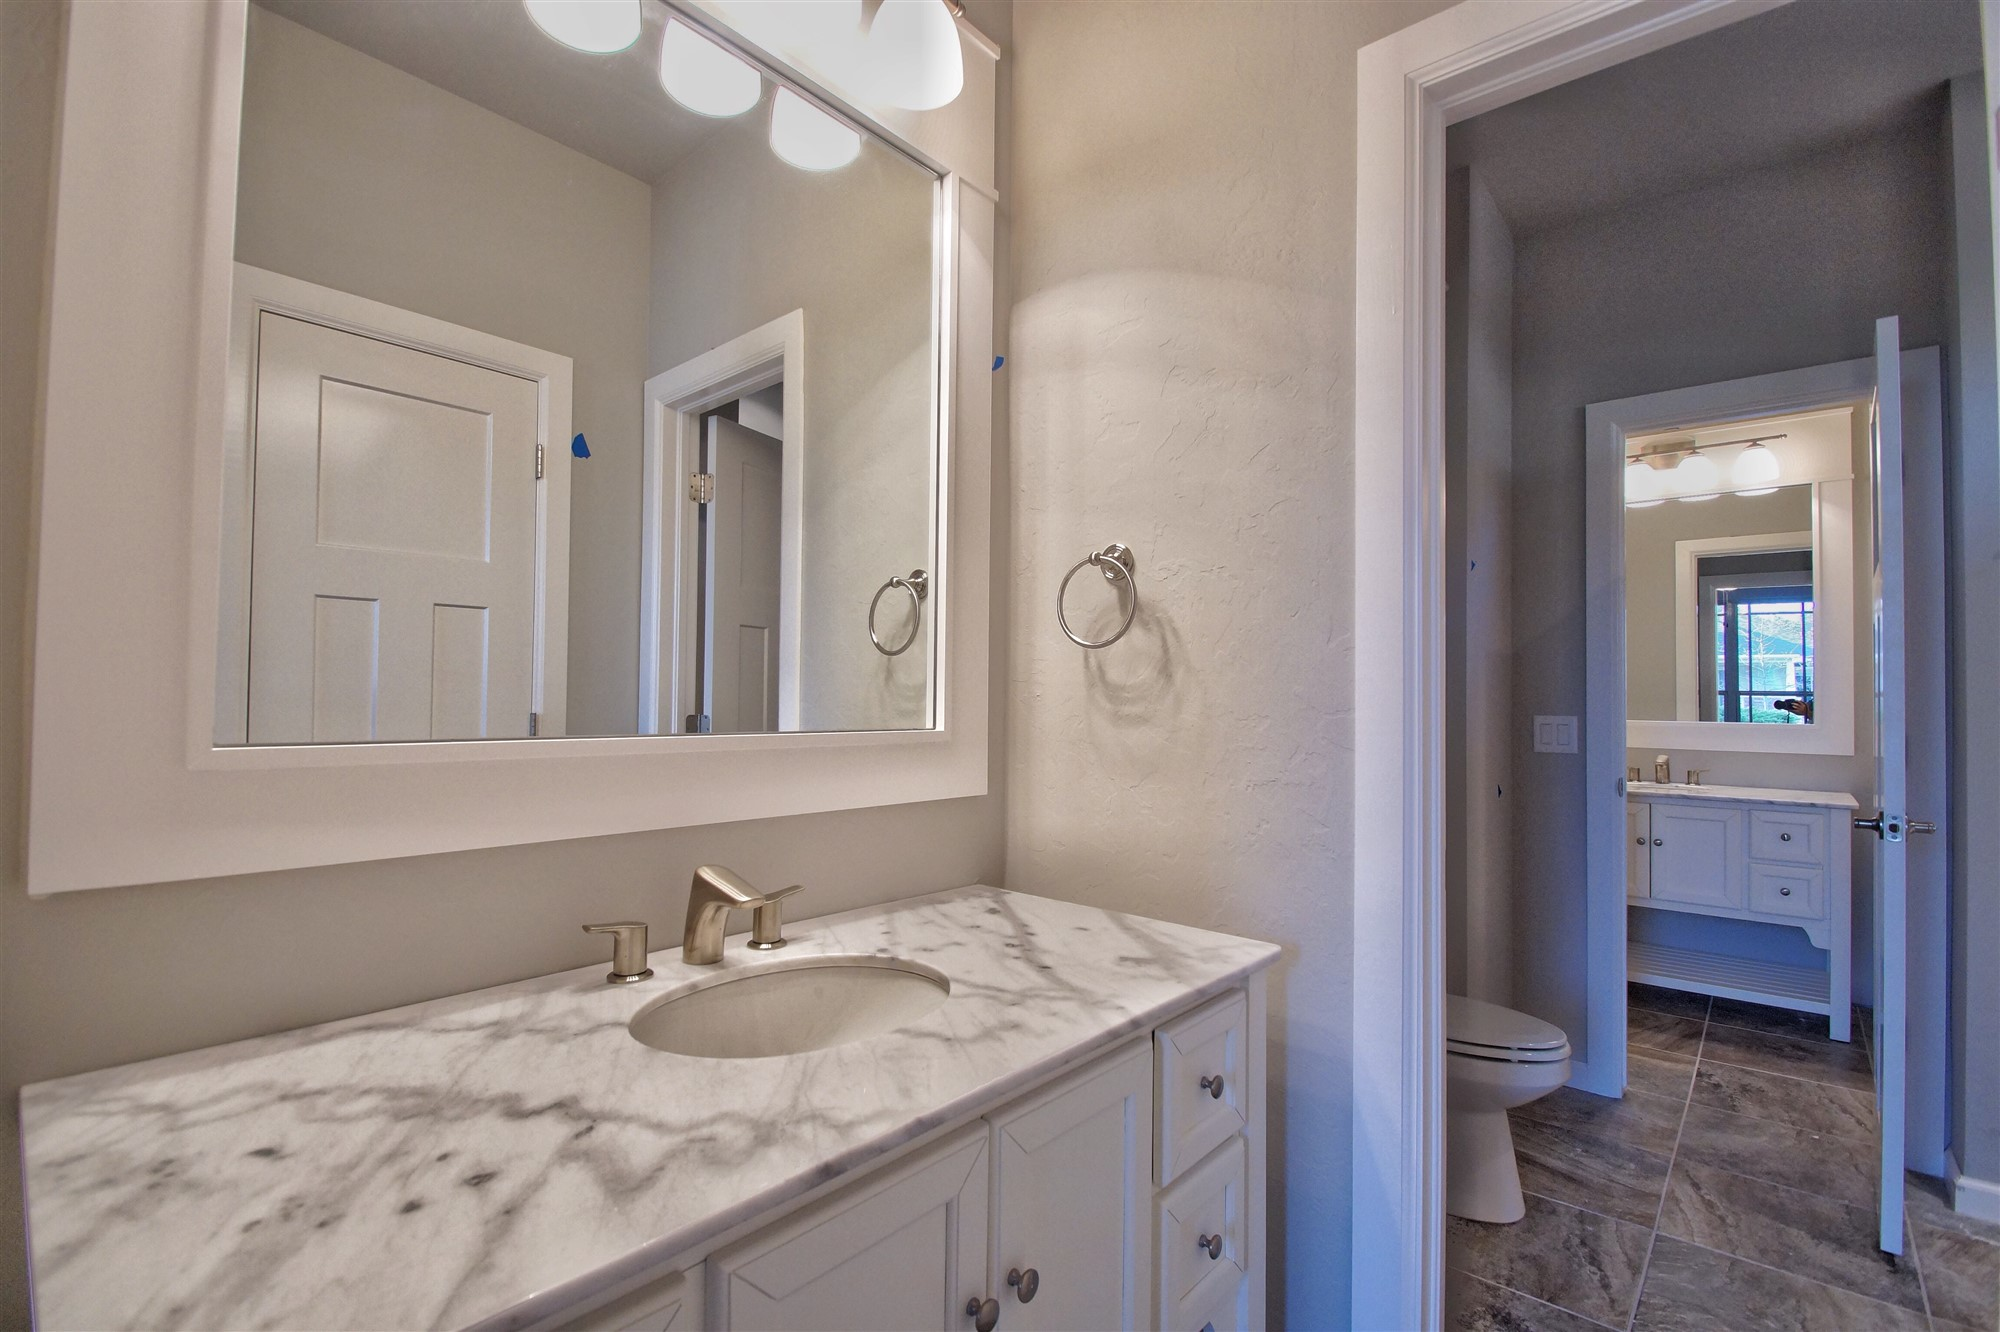 20 - Bathroom.jpg